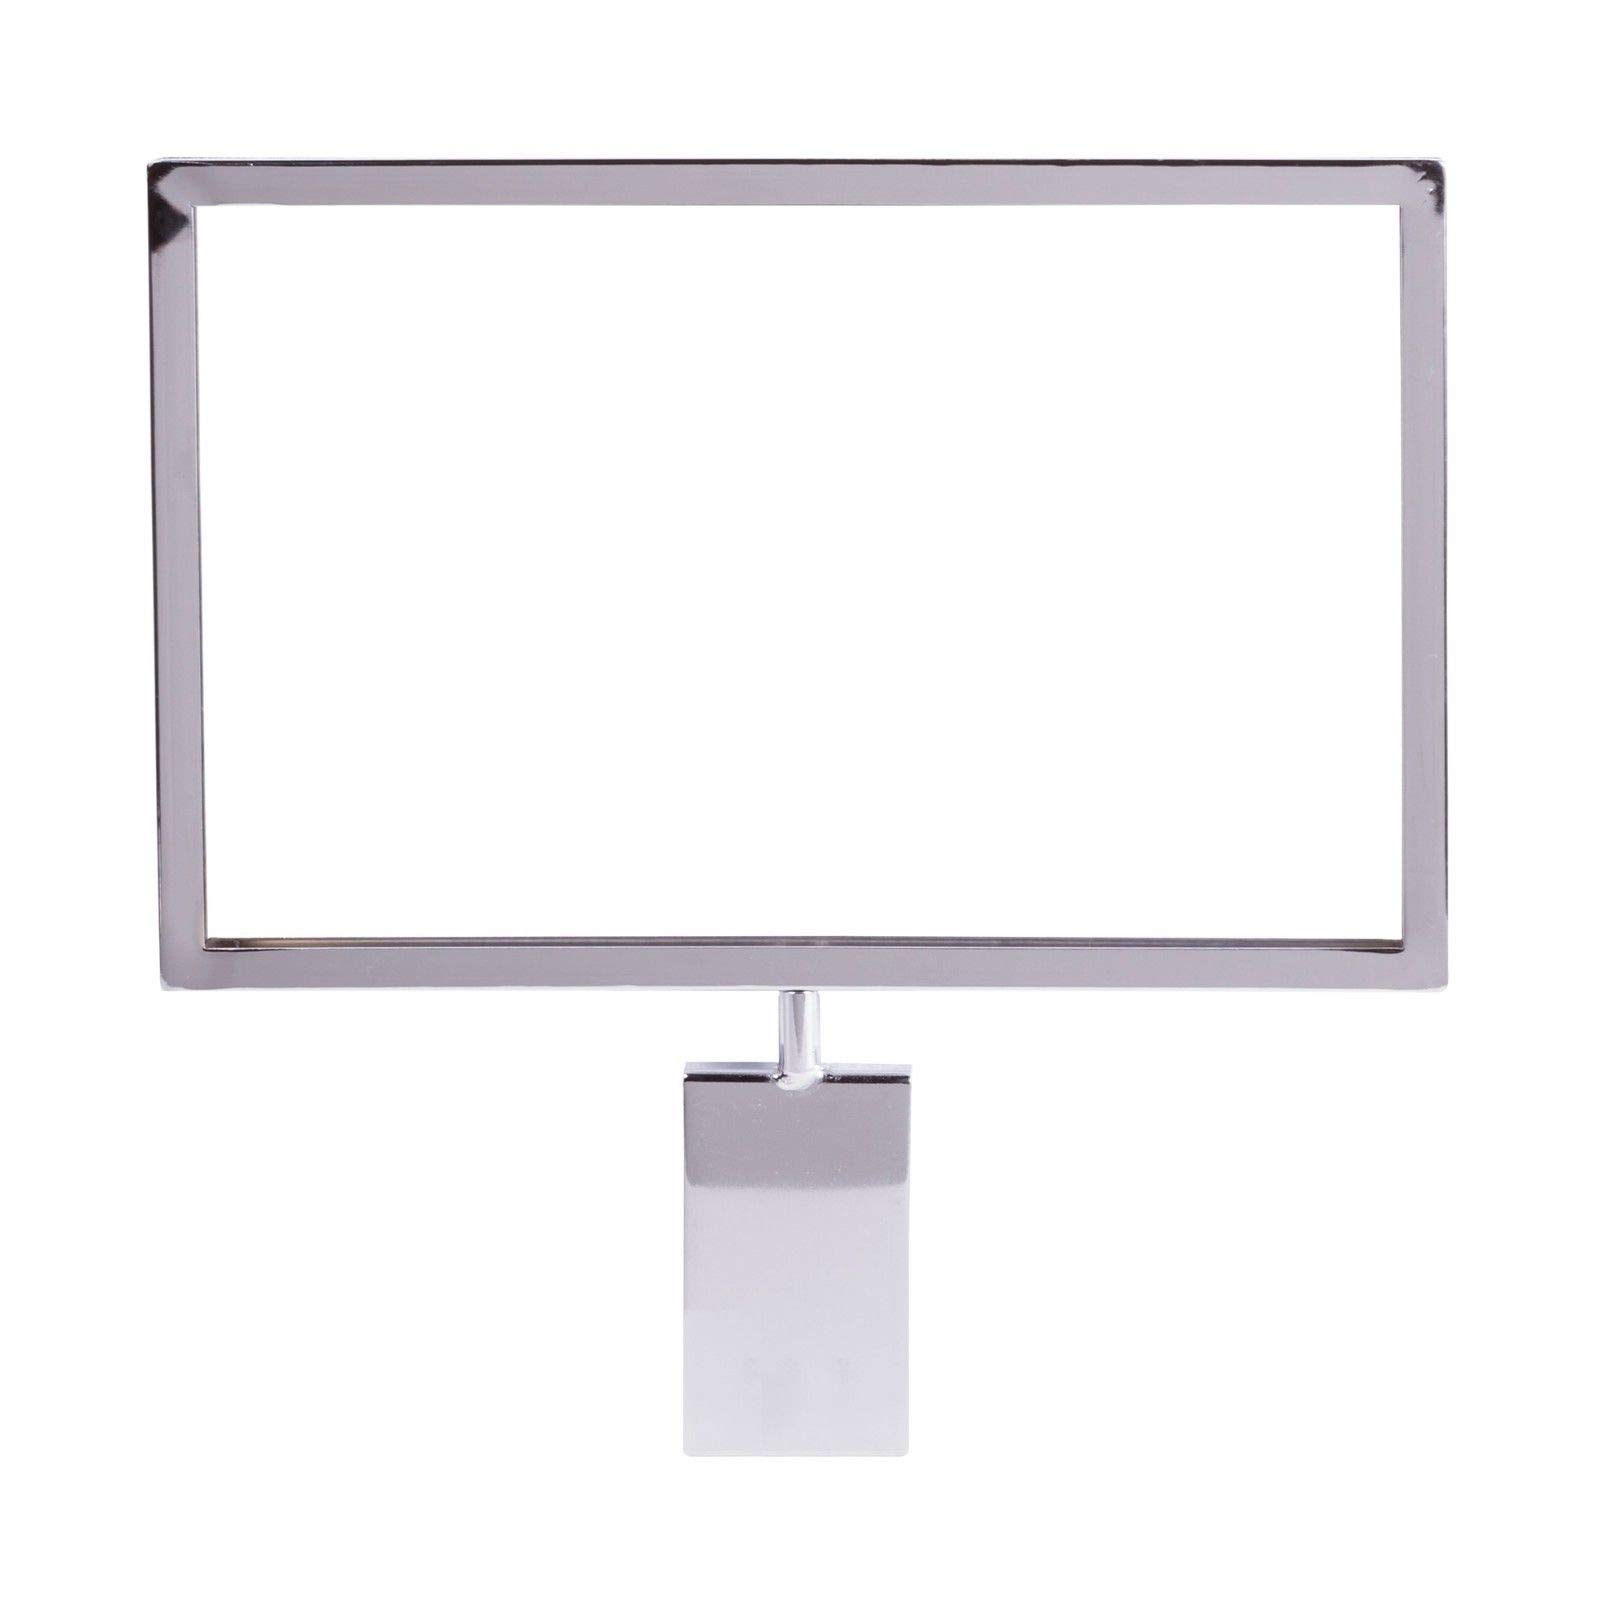 Gridwall Sign Holder, 7'' x 11'' Card Holder for & Grid Panels, Chrome, 10 Pack